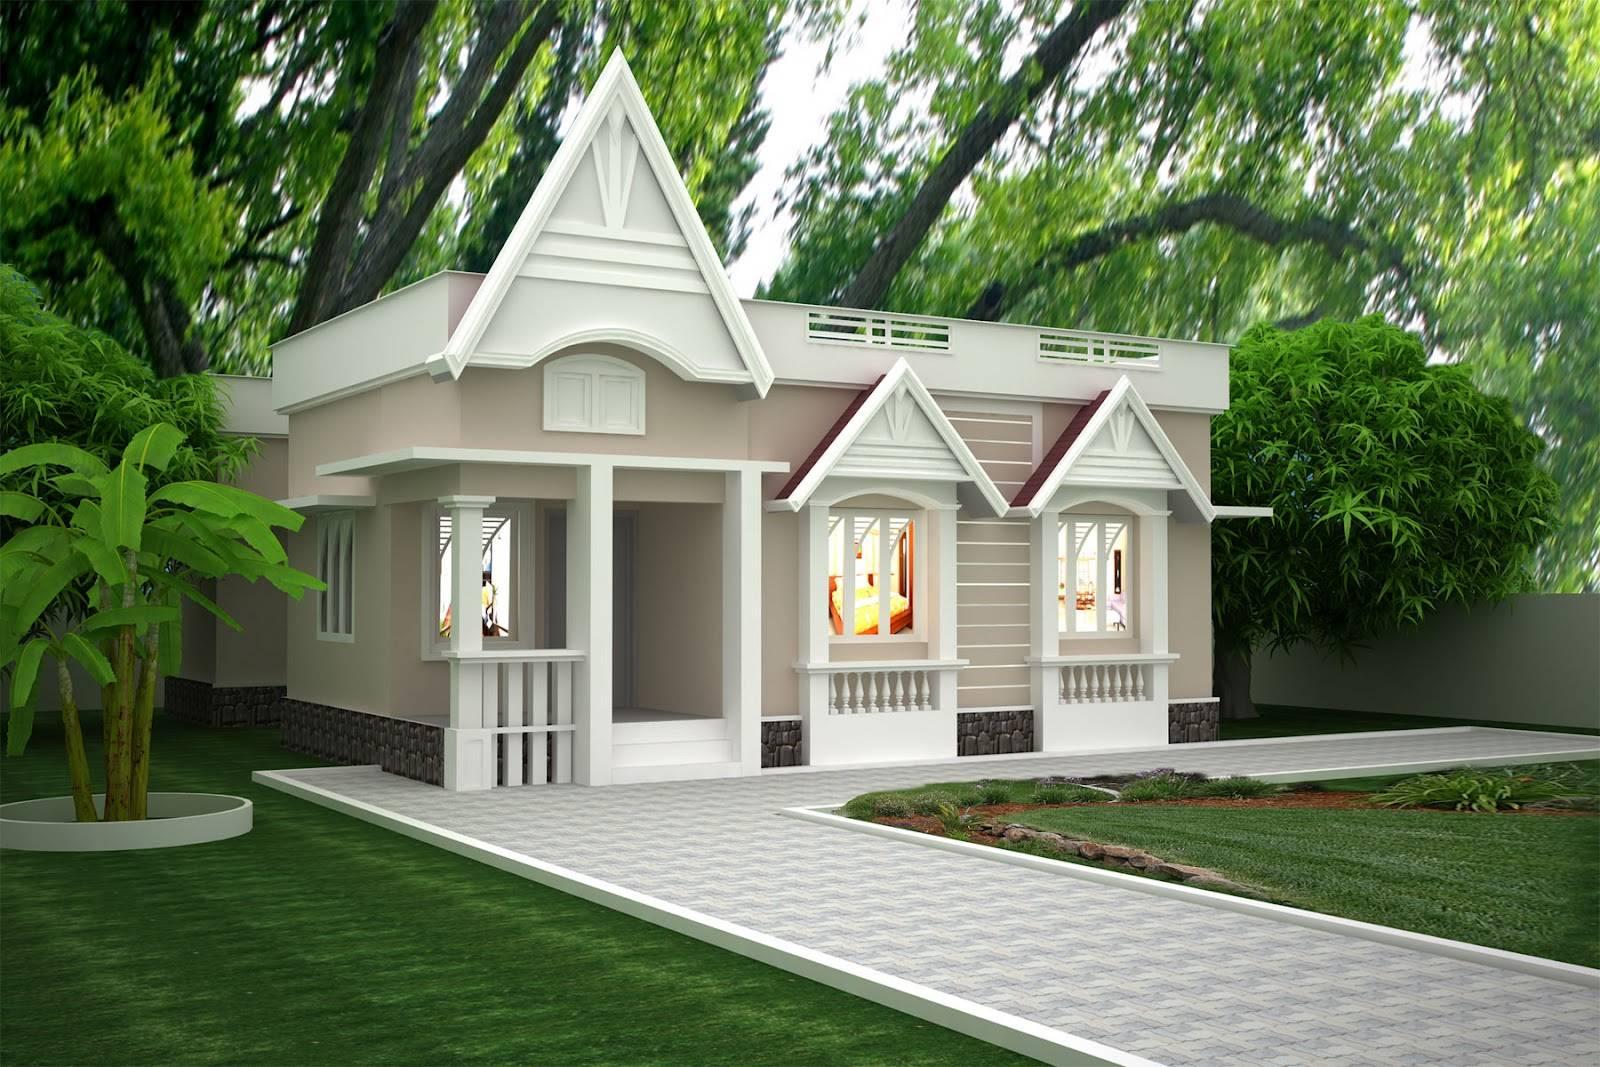 House Building Ideas on homeandlight.co - ^